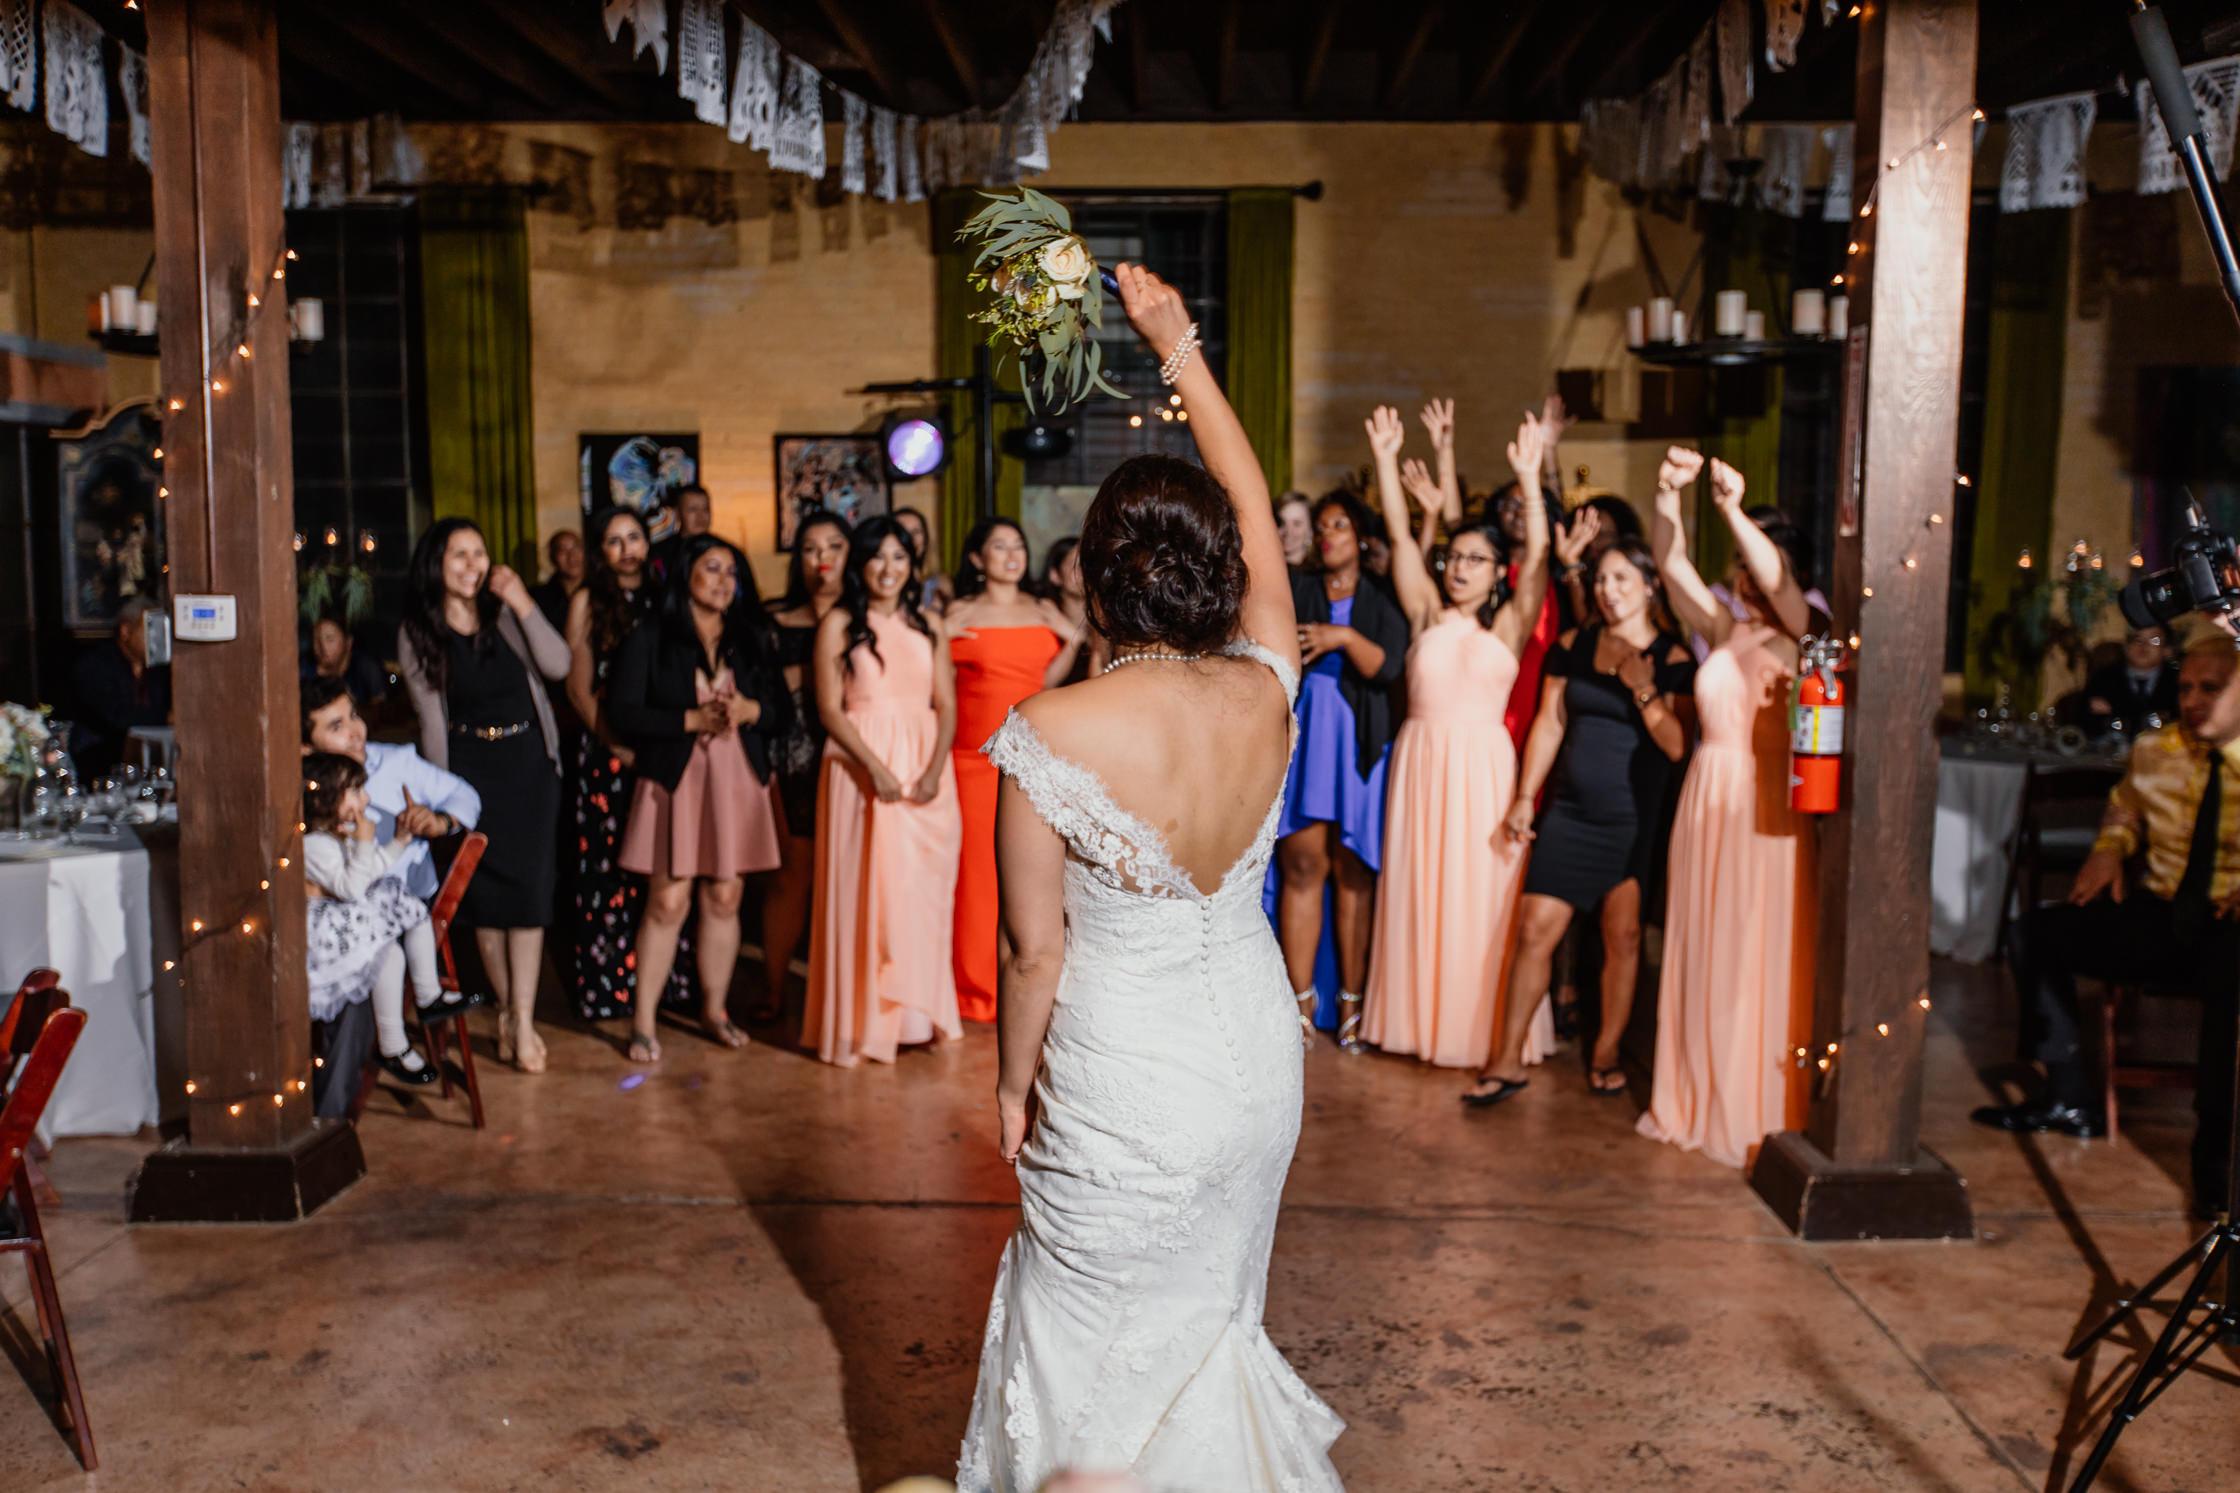 luis_joanna_wedding-119.jpg